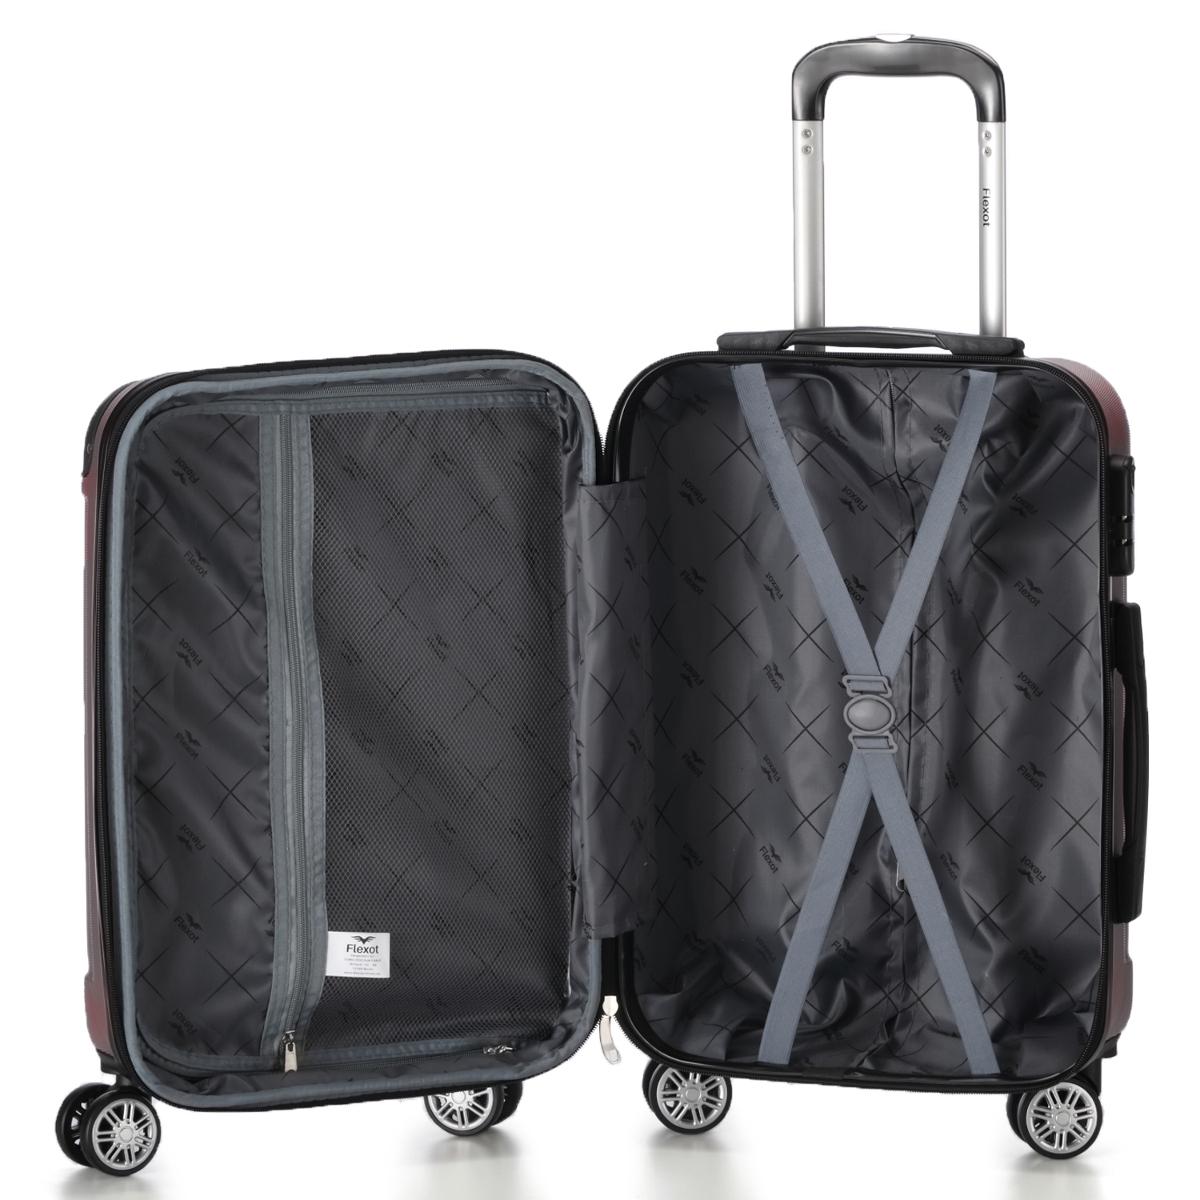 Koffer-Flexot-2045-Hartschalenkoffer-Trolley-Kofferset-Reisekoffer-M-L-XL-Set Indexbild 30